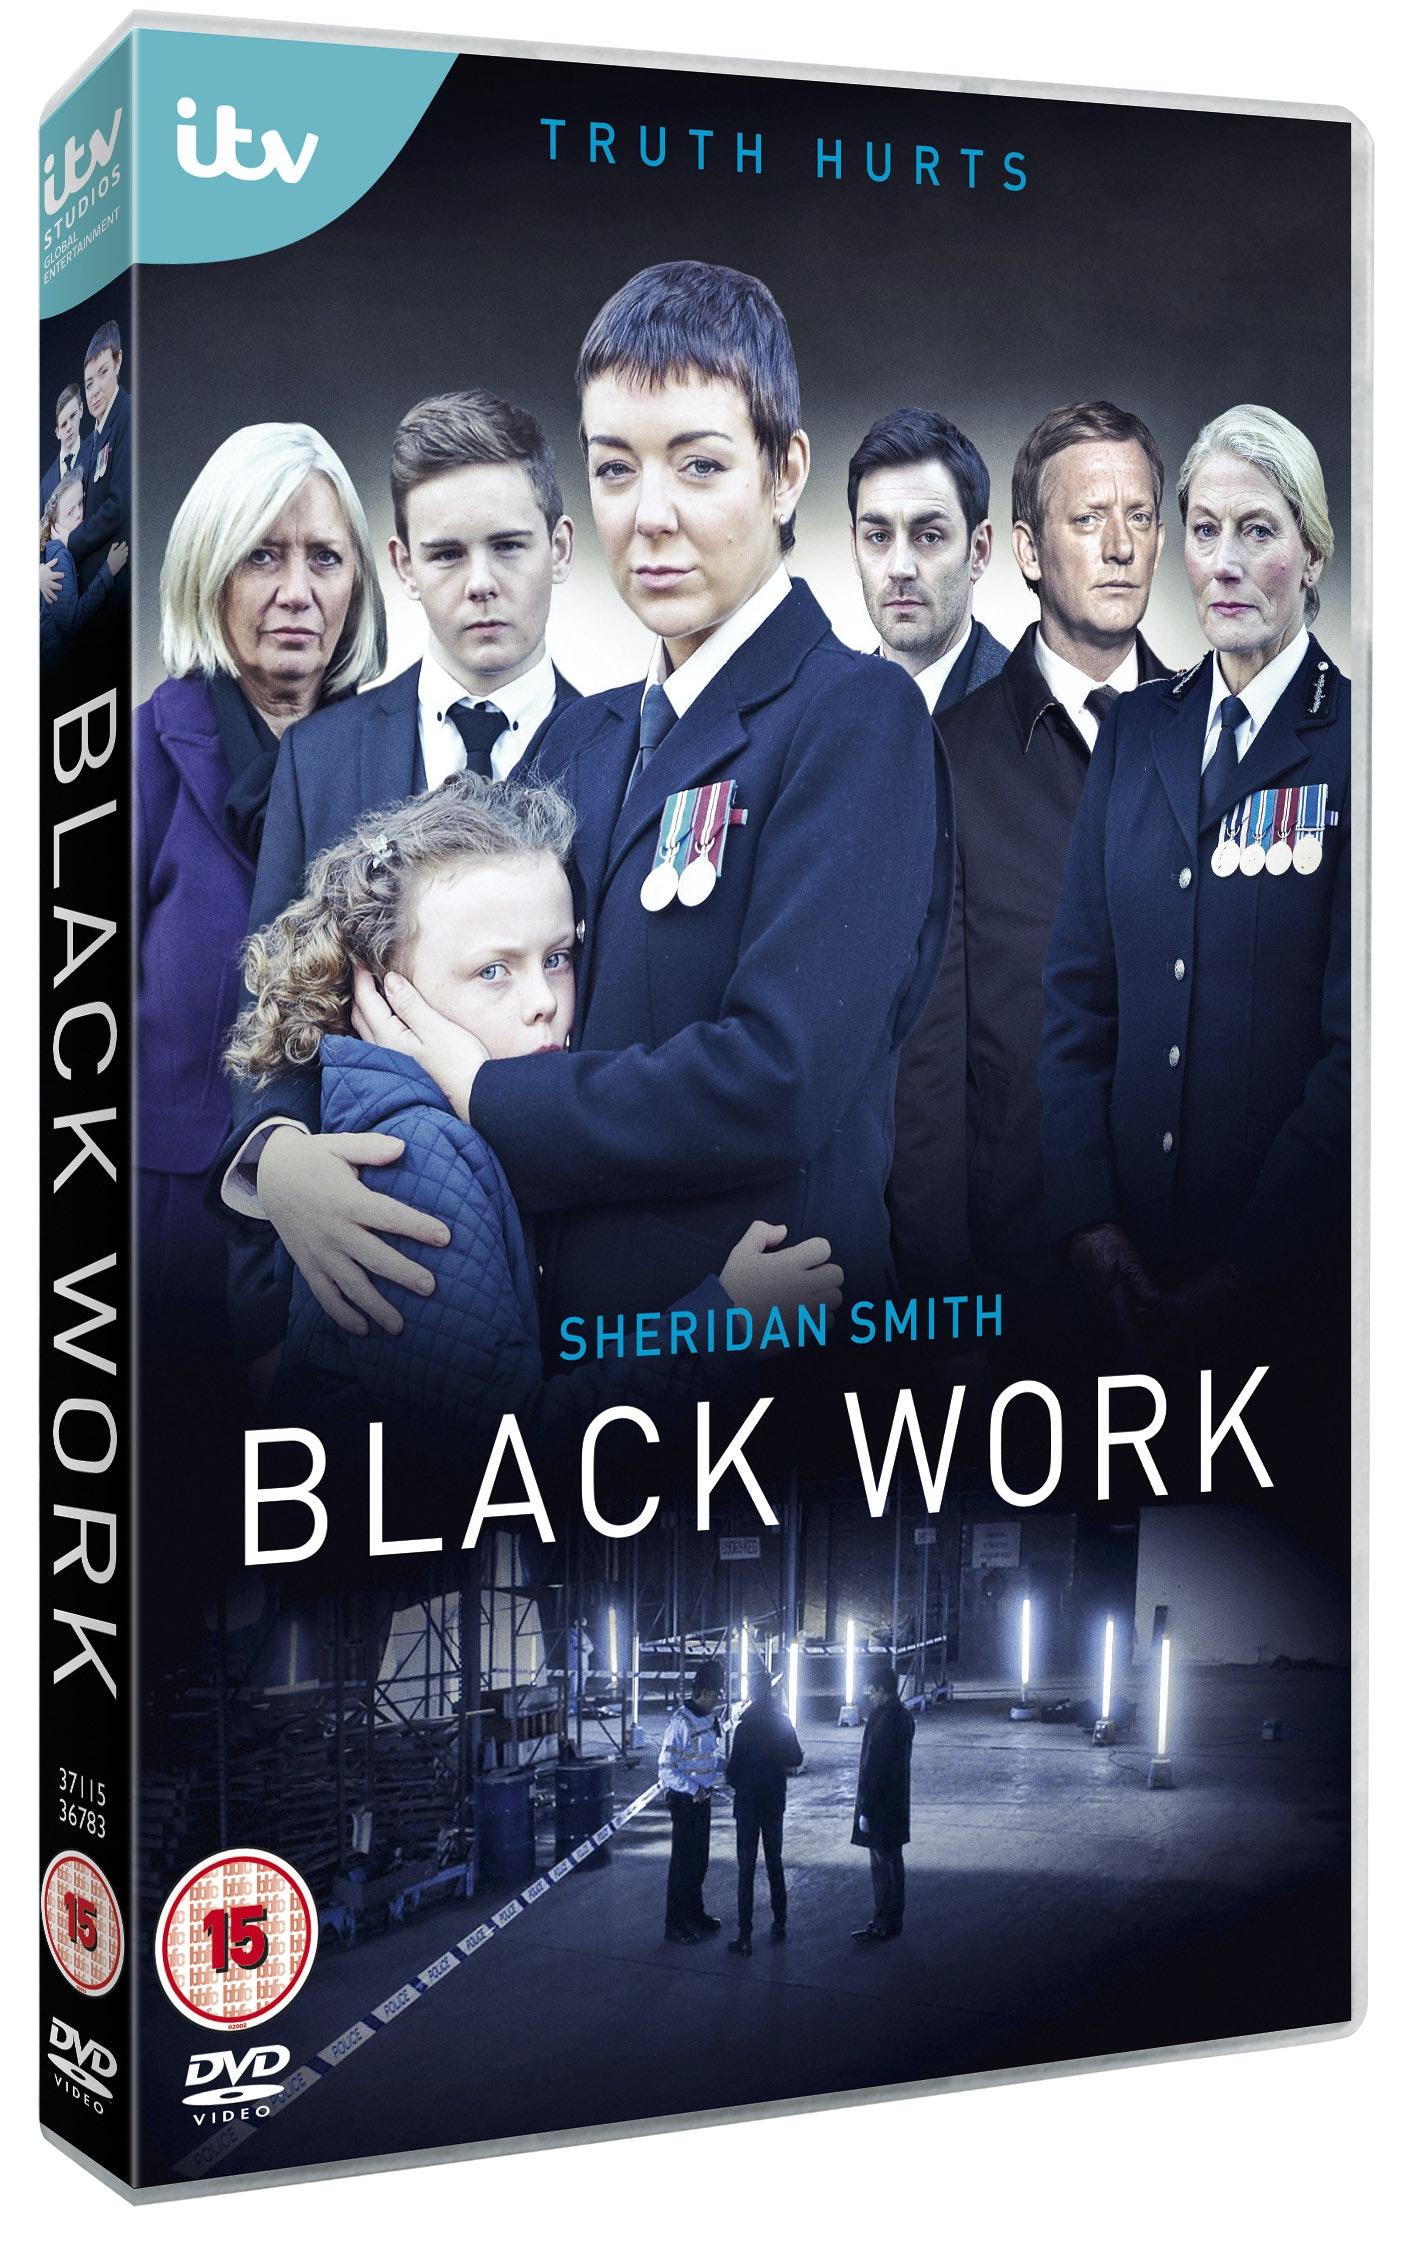 Black Work DVD sweepstakes